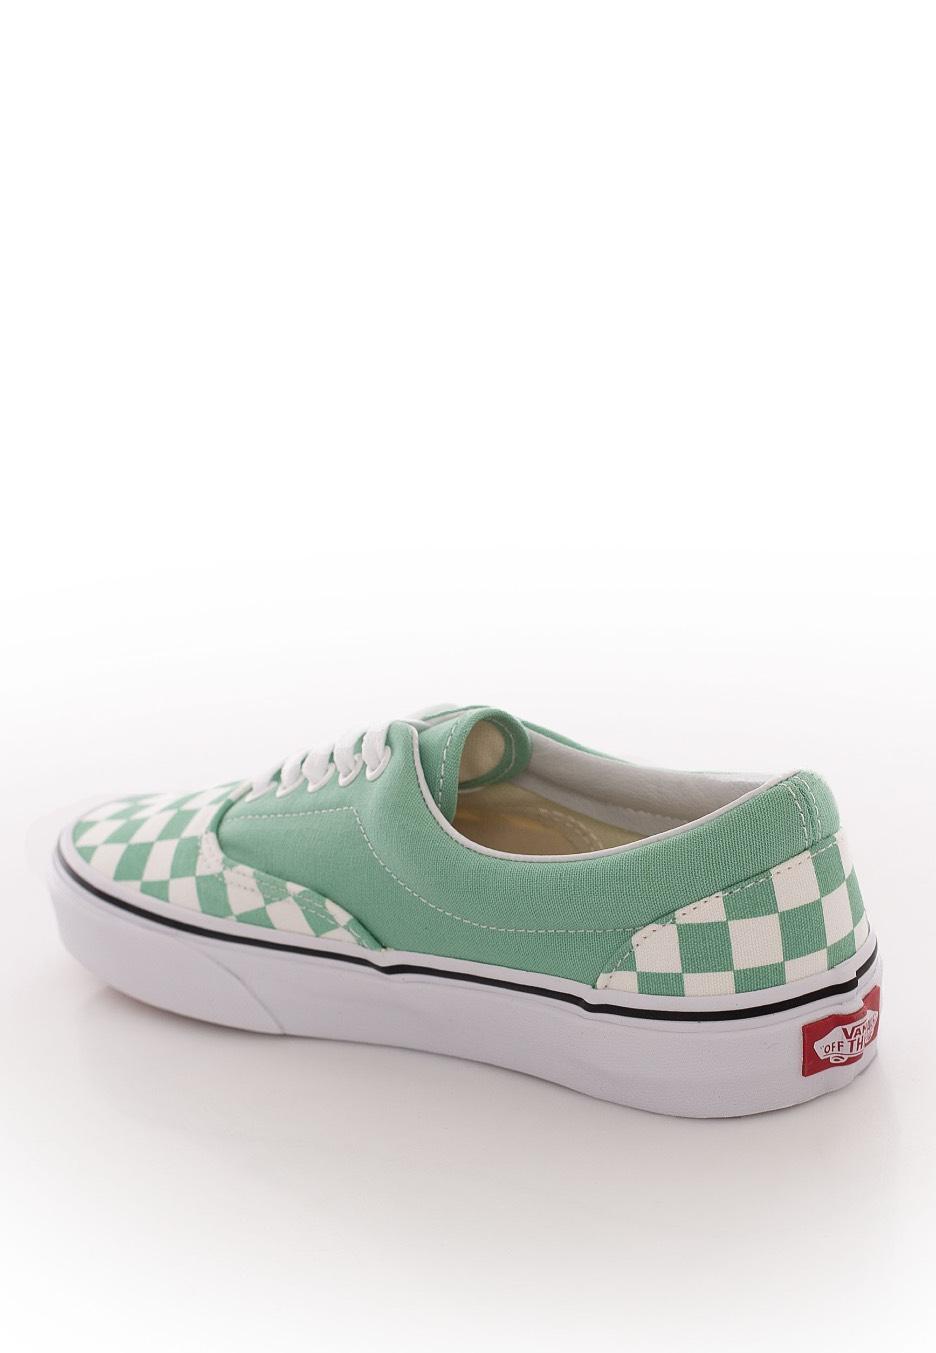 Vans - Era Checkerboard Neptune Green - Girl Shoes - Impericon.com AU 3f75efb13